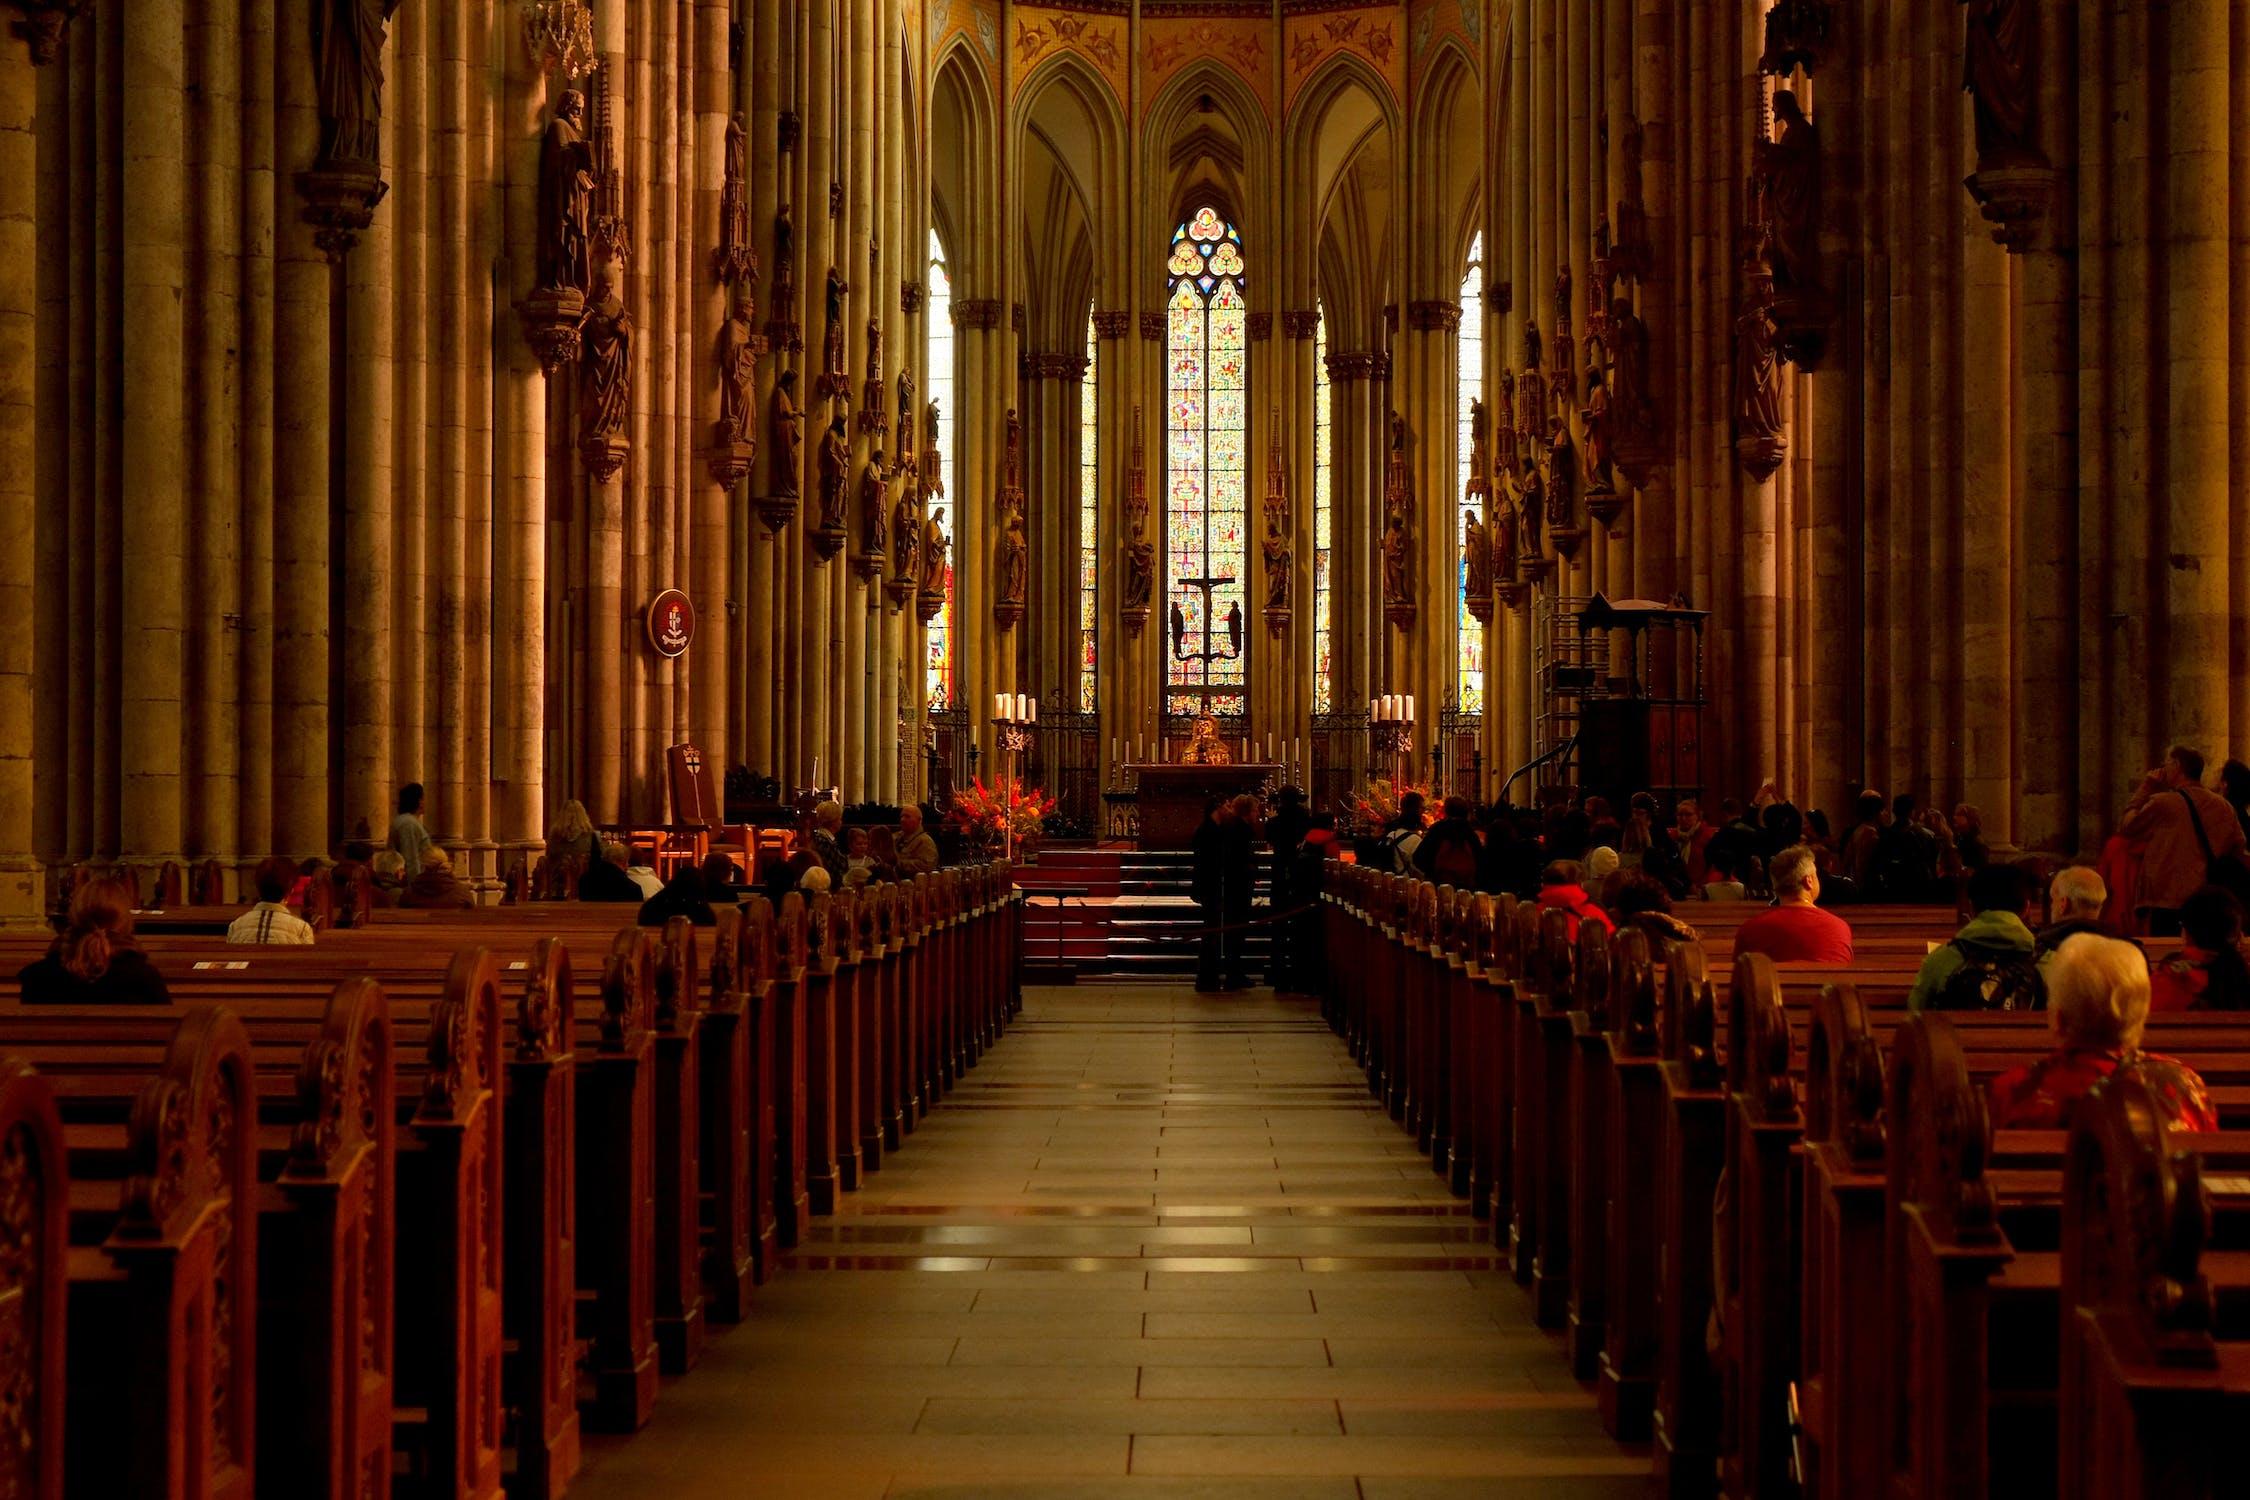 a prayer for unity as a church body